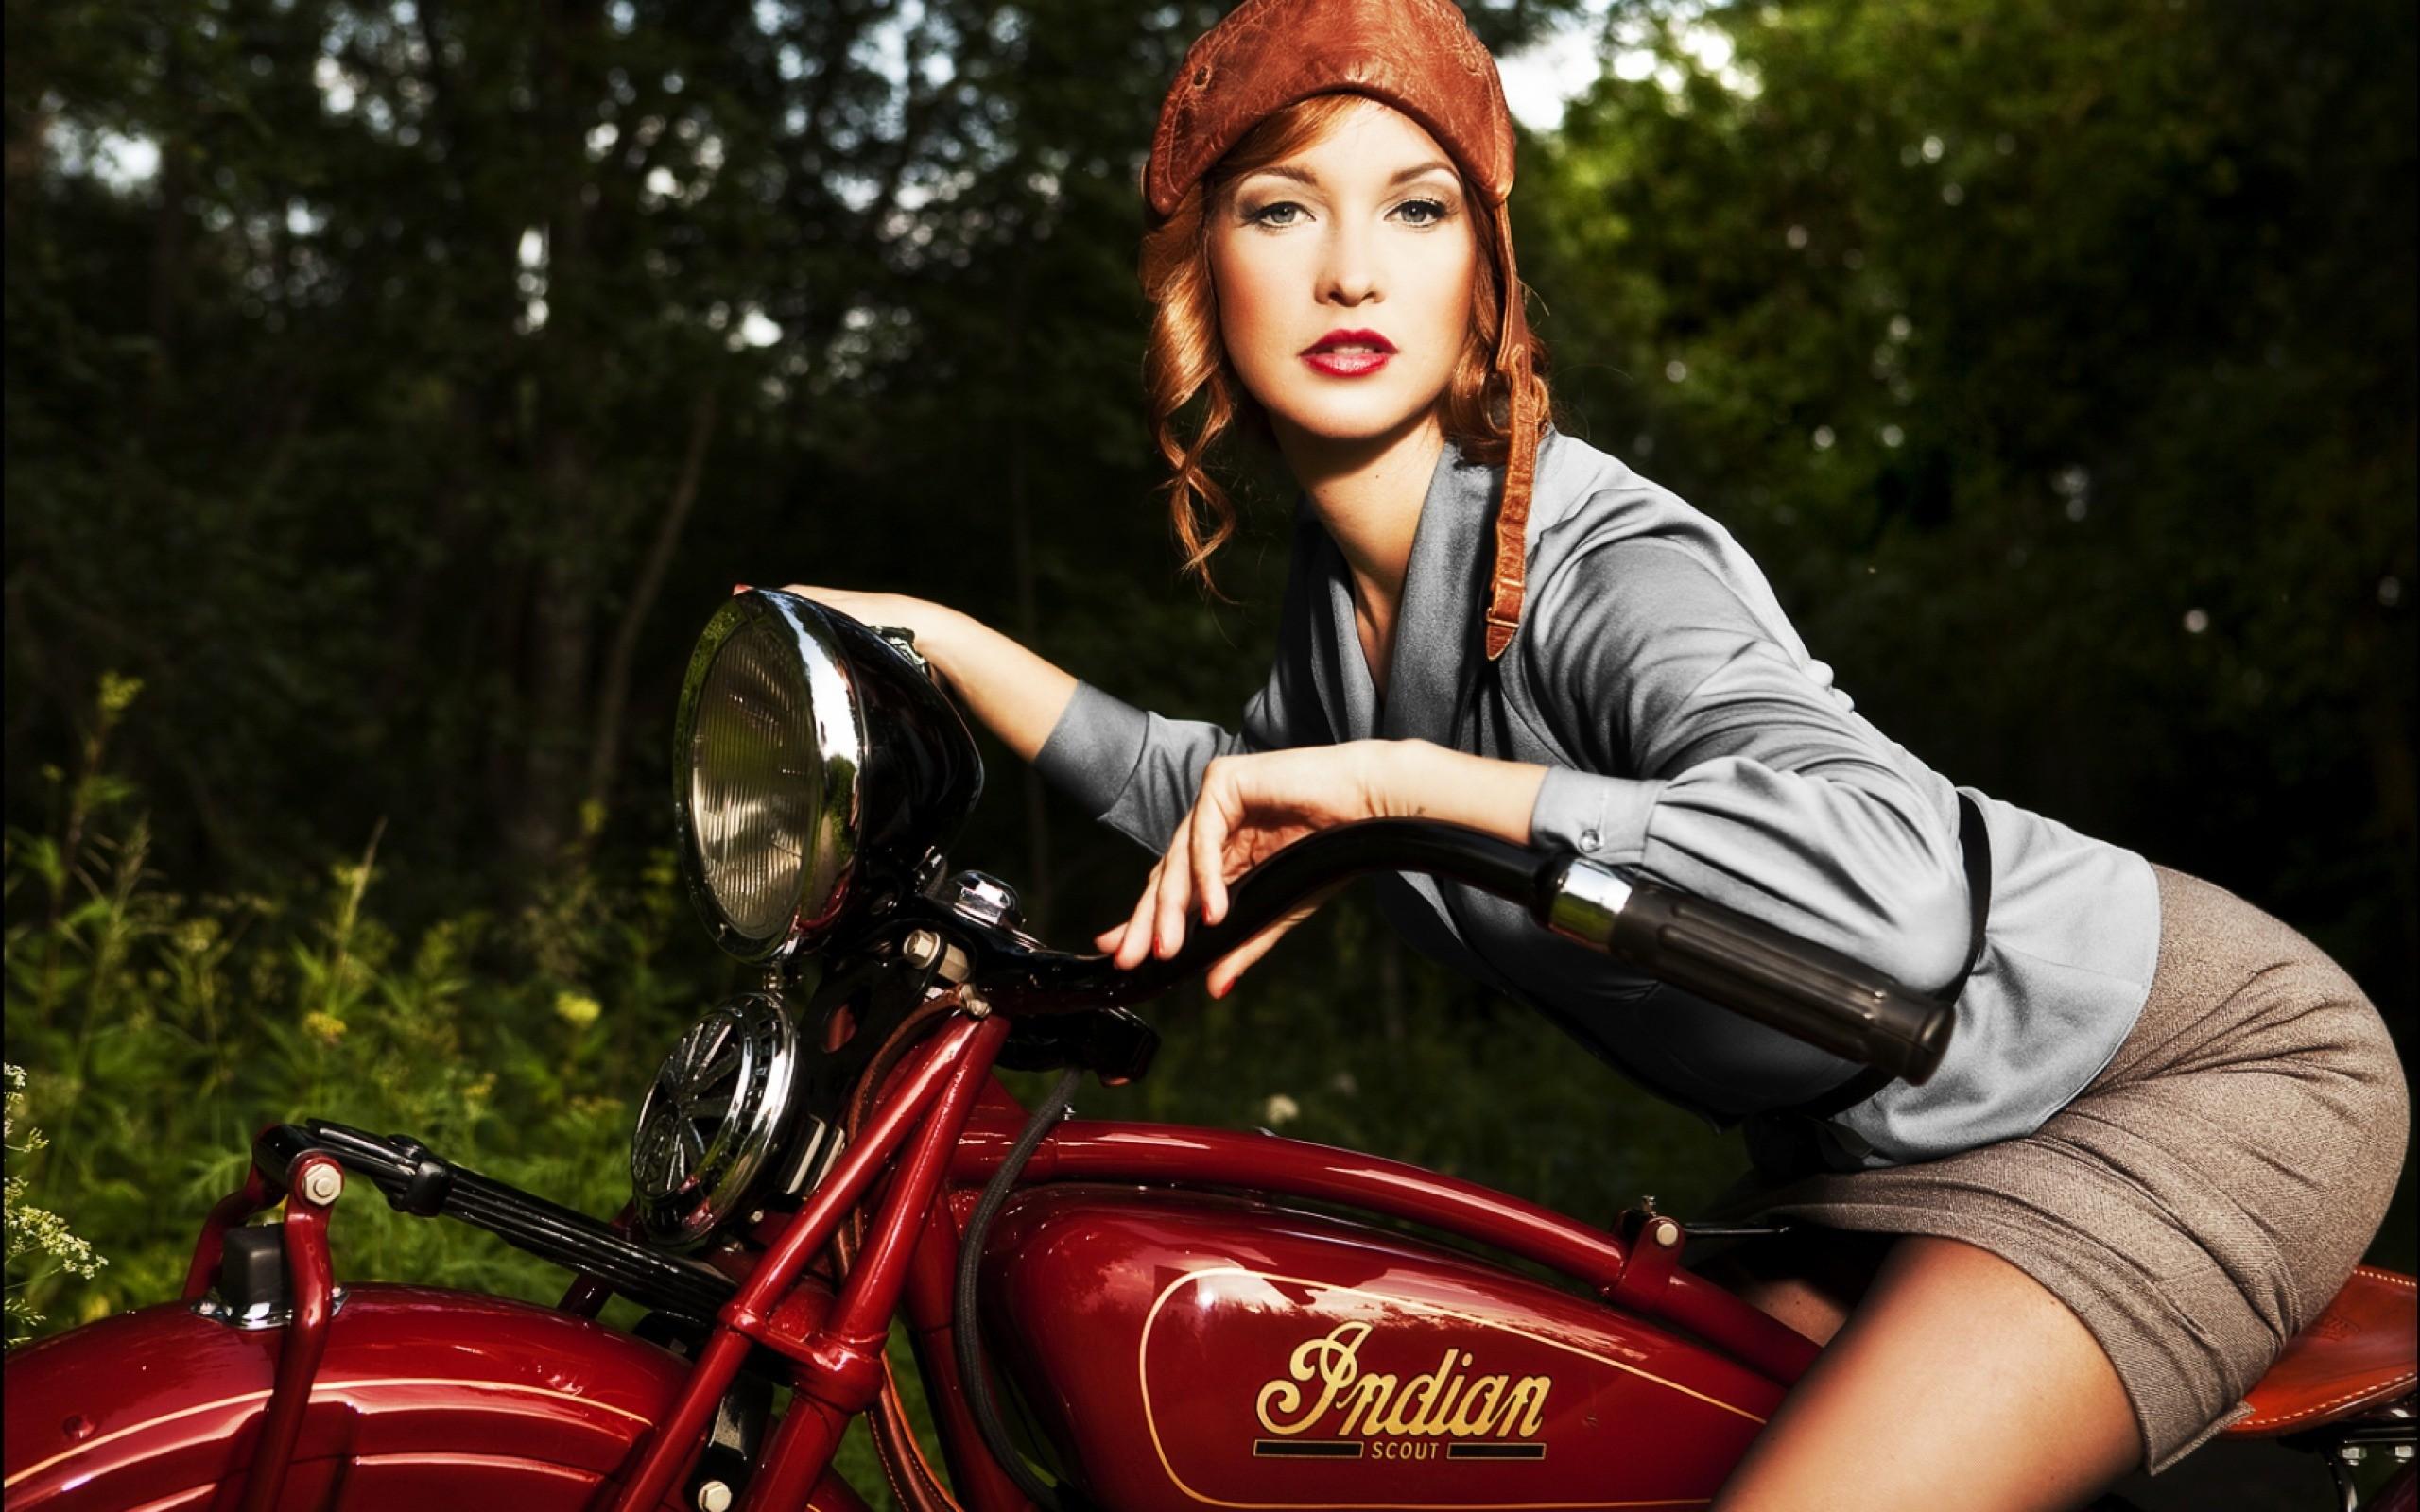 71] Vintage Motorcycle Wallpaper on WallpaperSafari 2560x1600